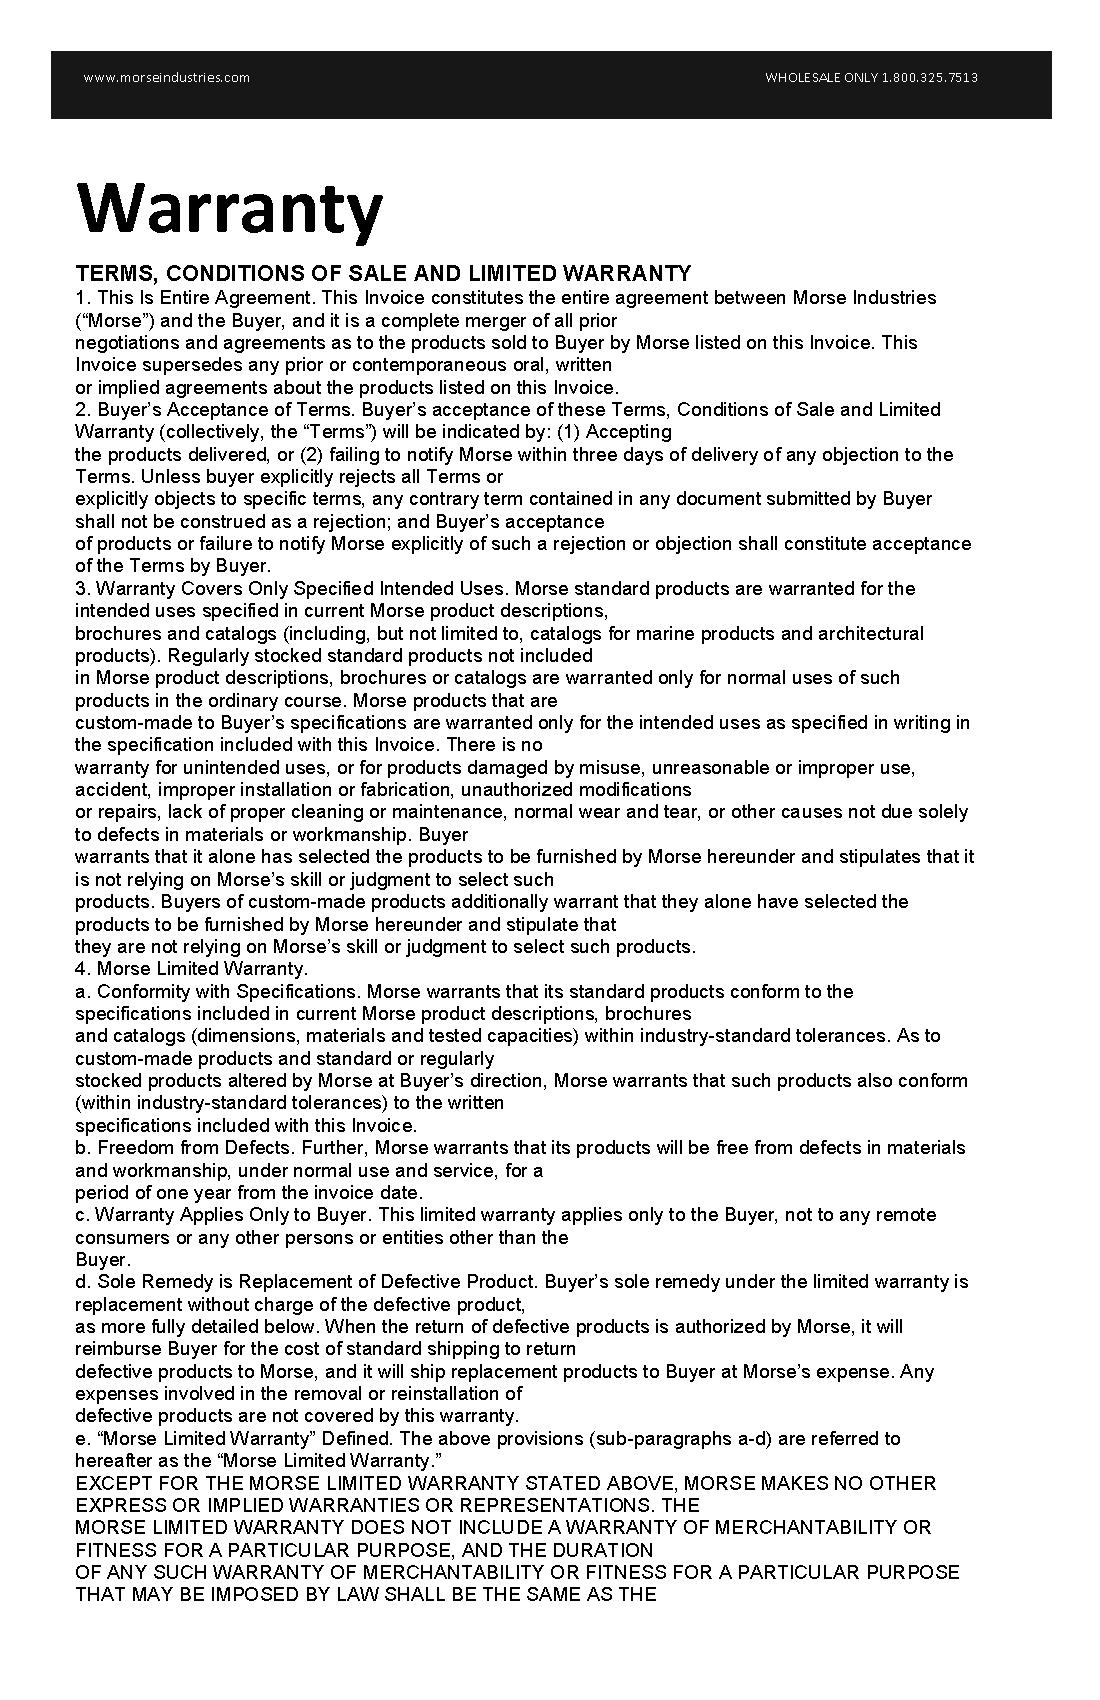 Morse Warranty_Page_1